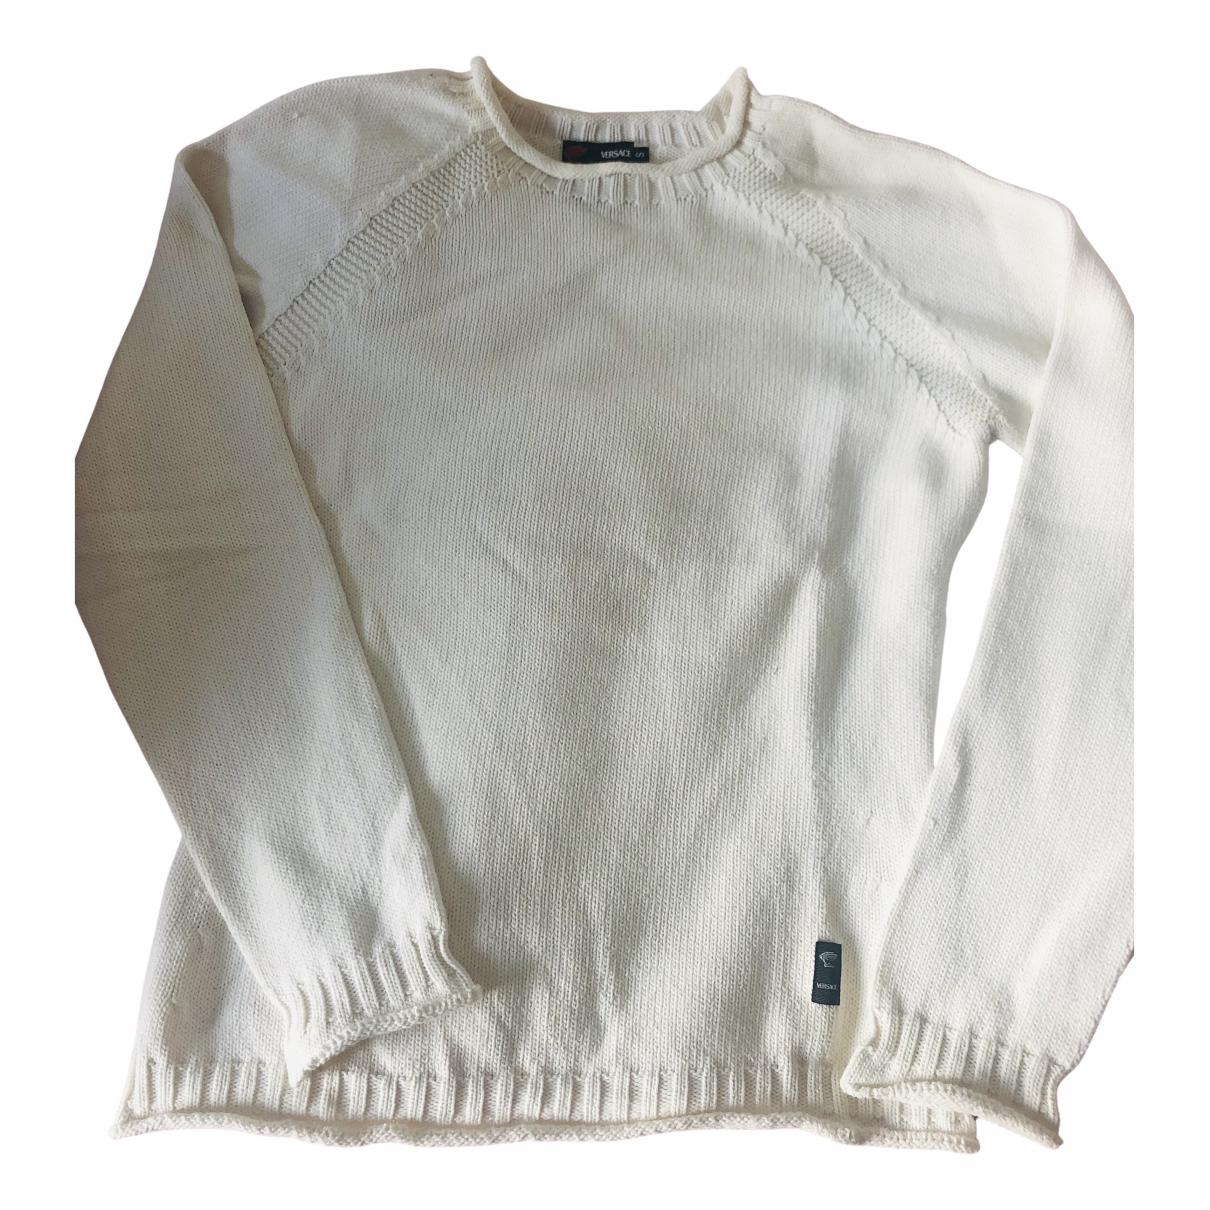 Versace N White Cotton Knitwear for Women S International